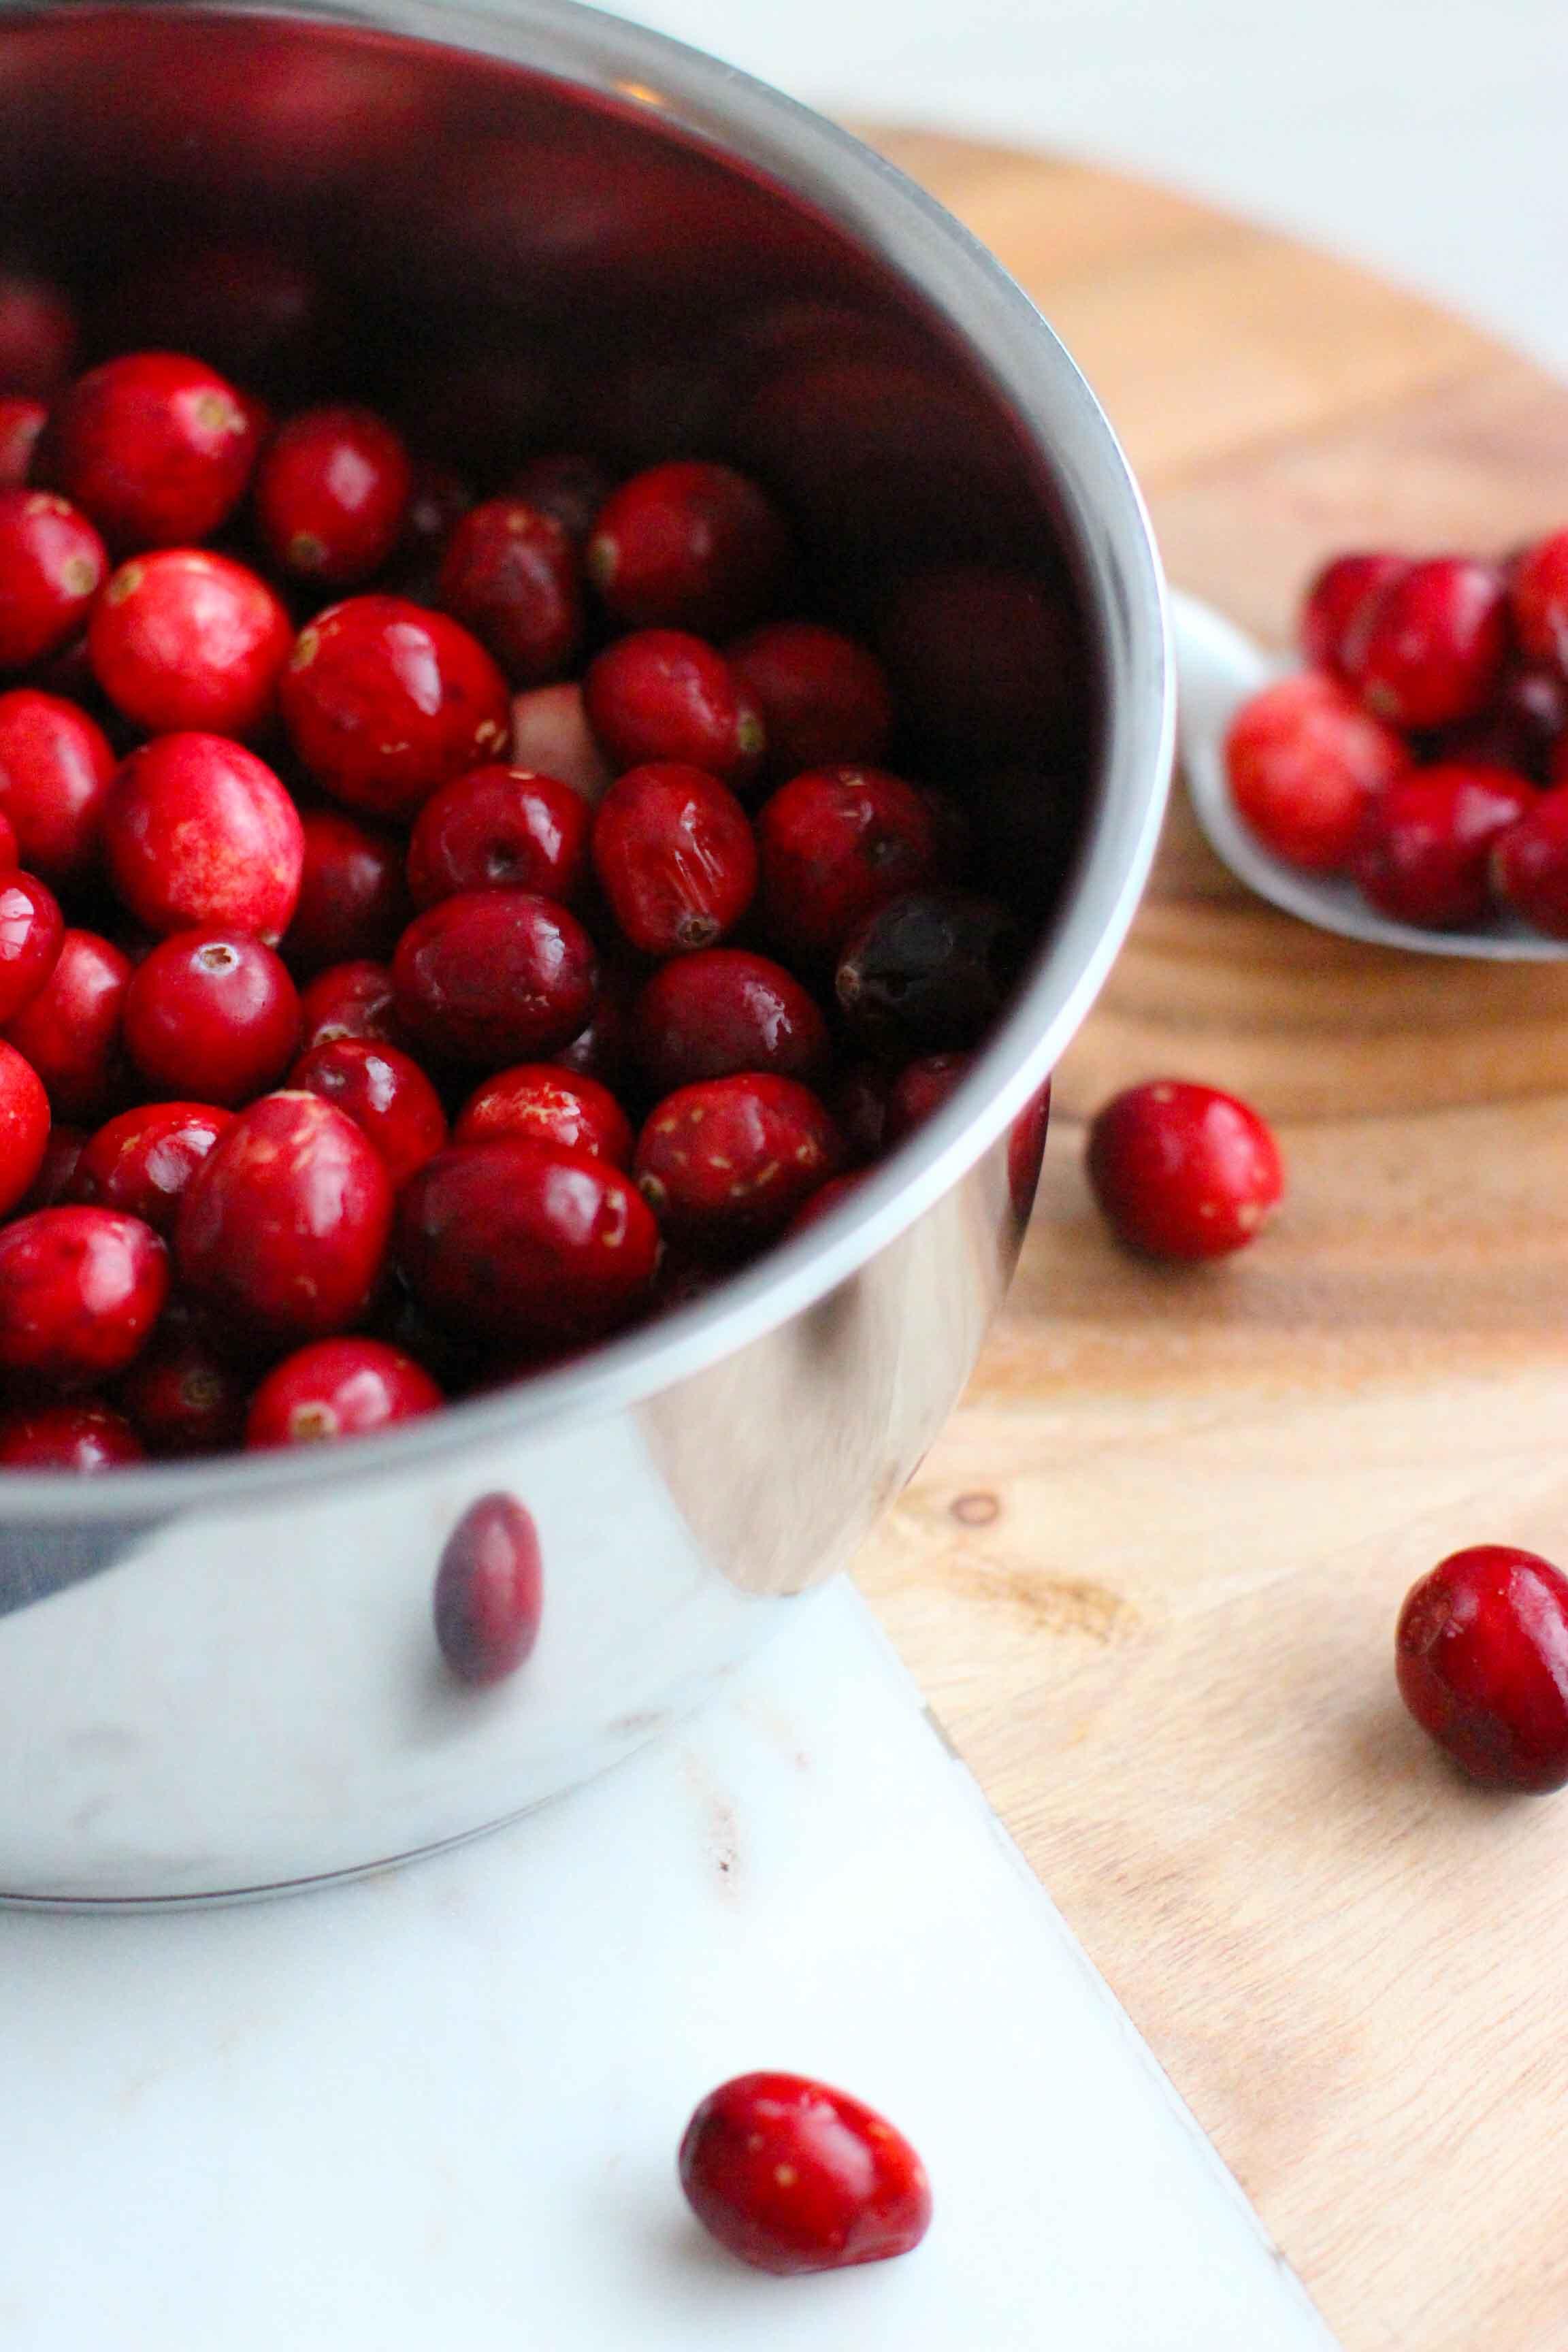 suikervrije-cranberry-saus-gezond